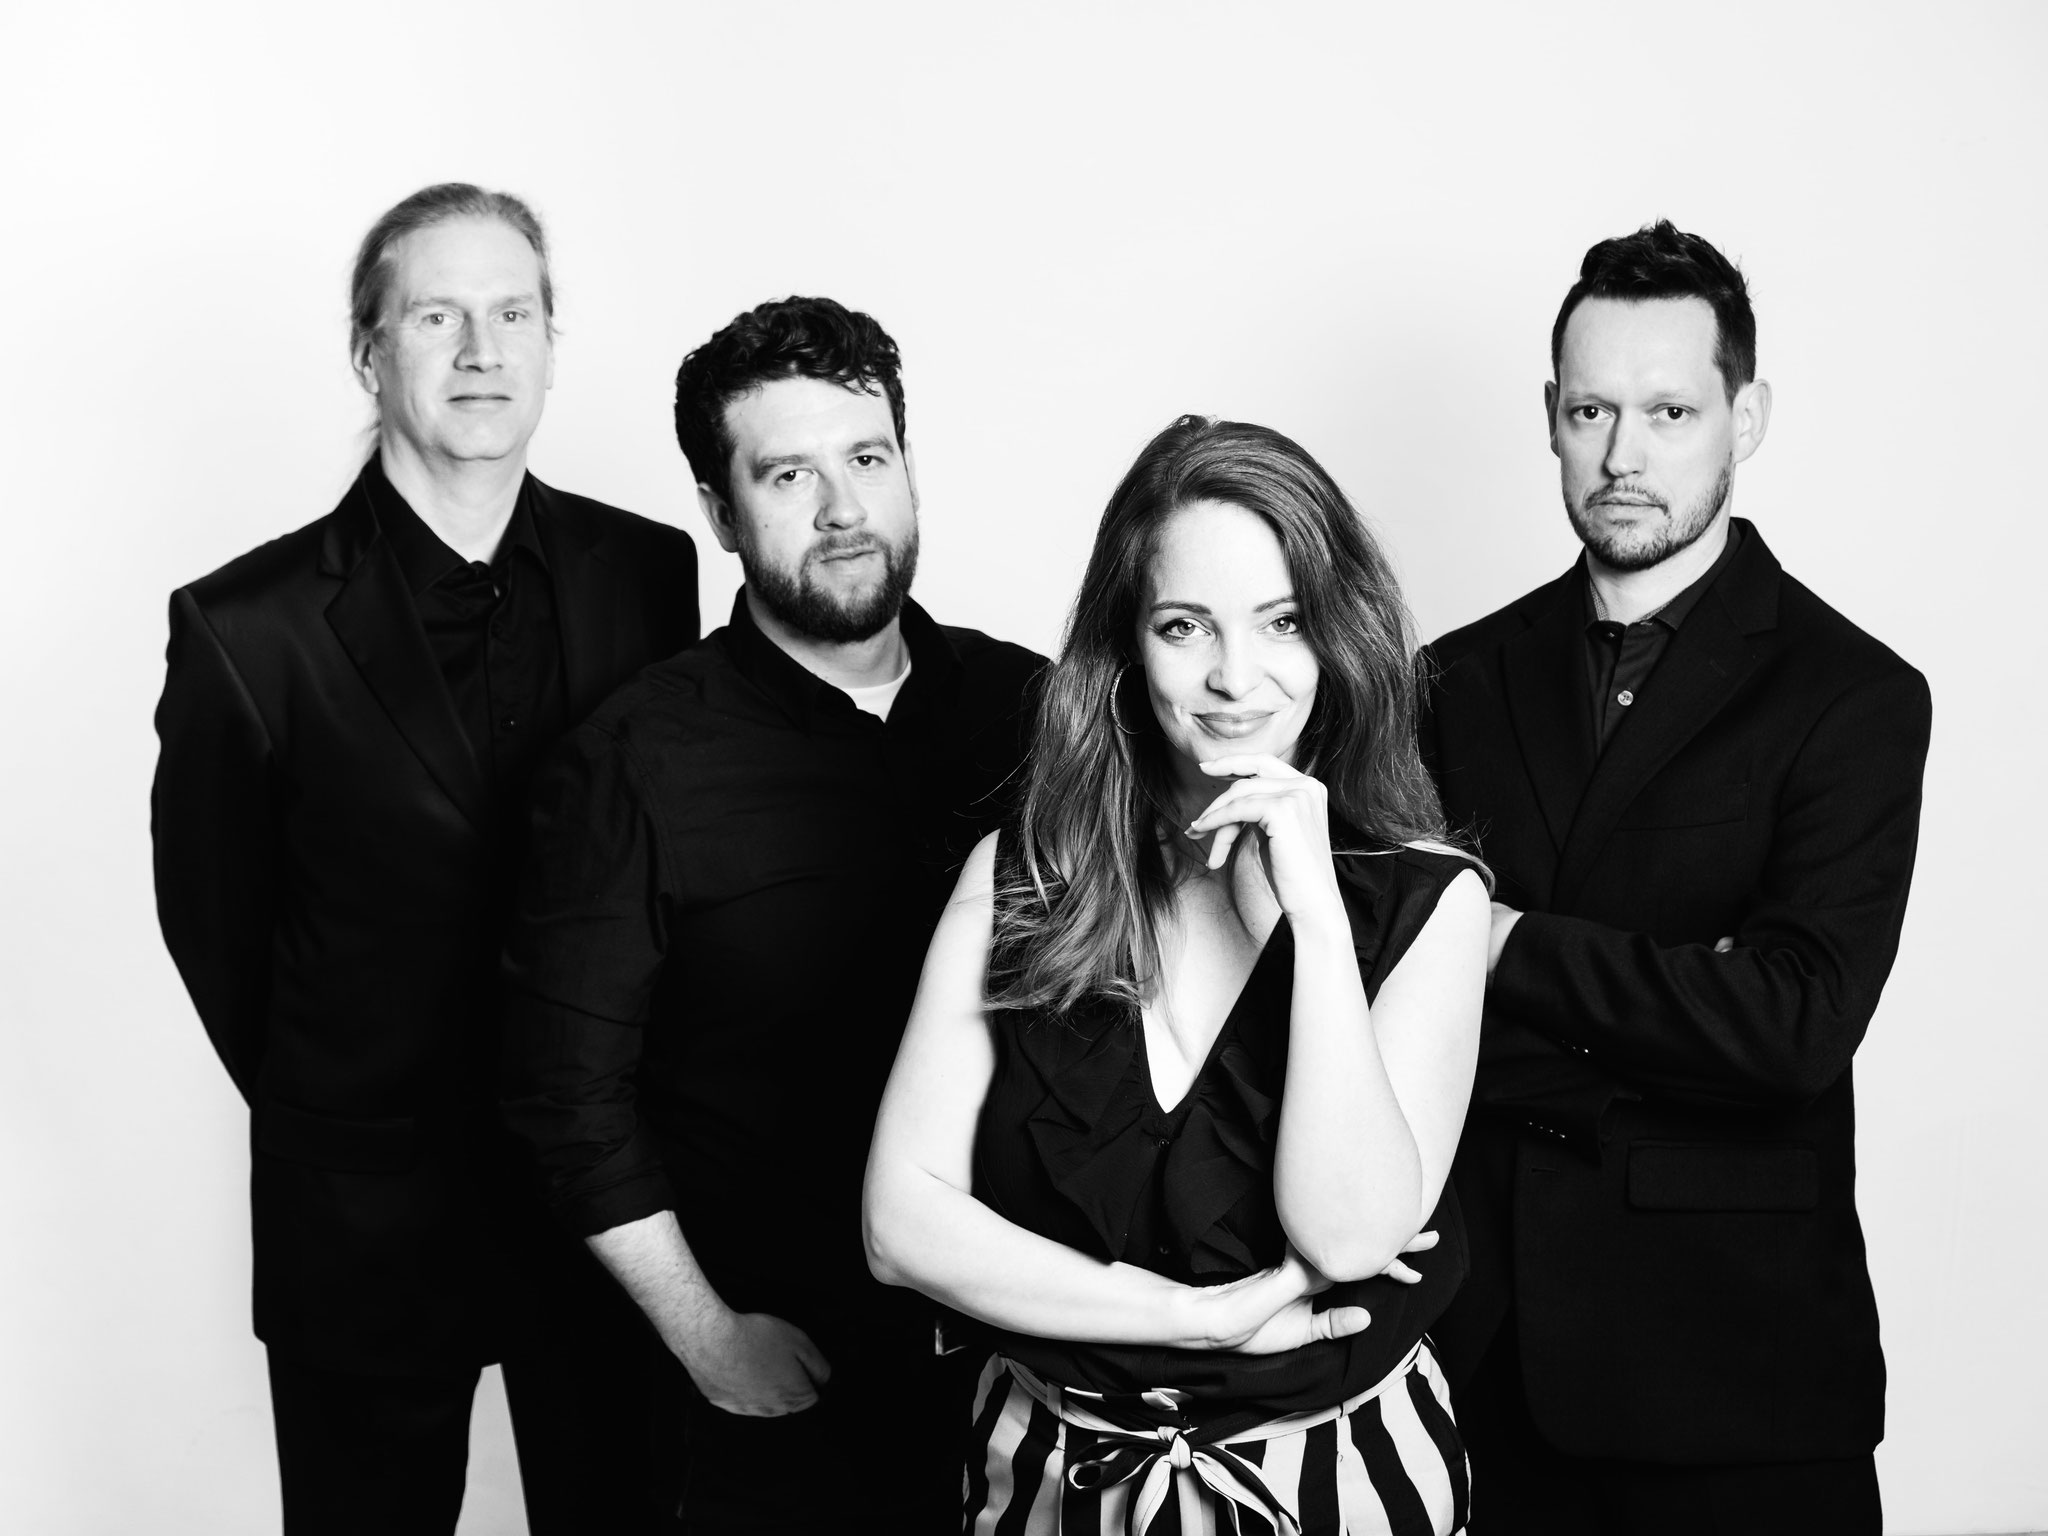 OverNight Band | Foto: Georg Buxhofer